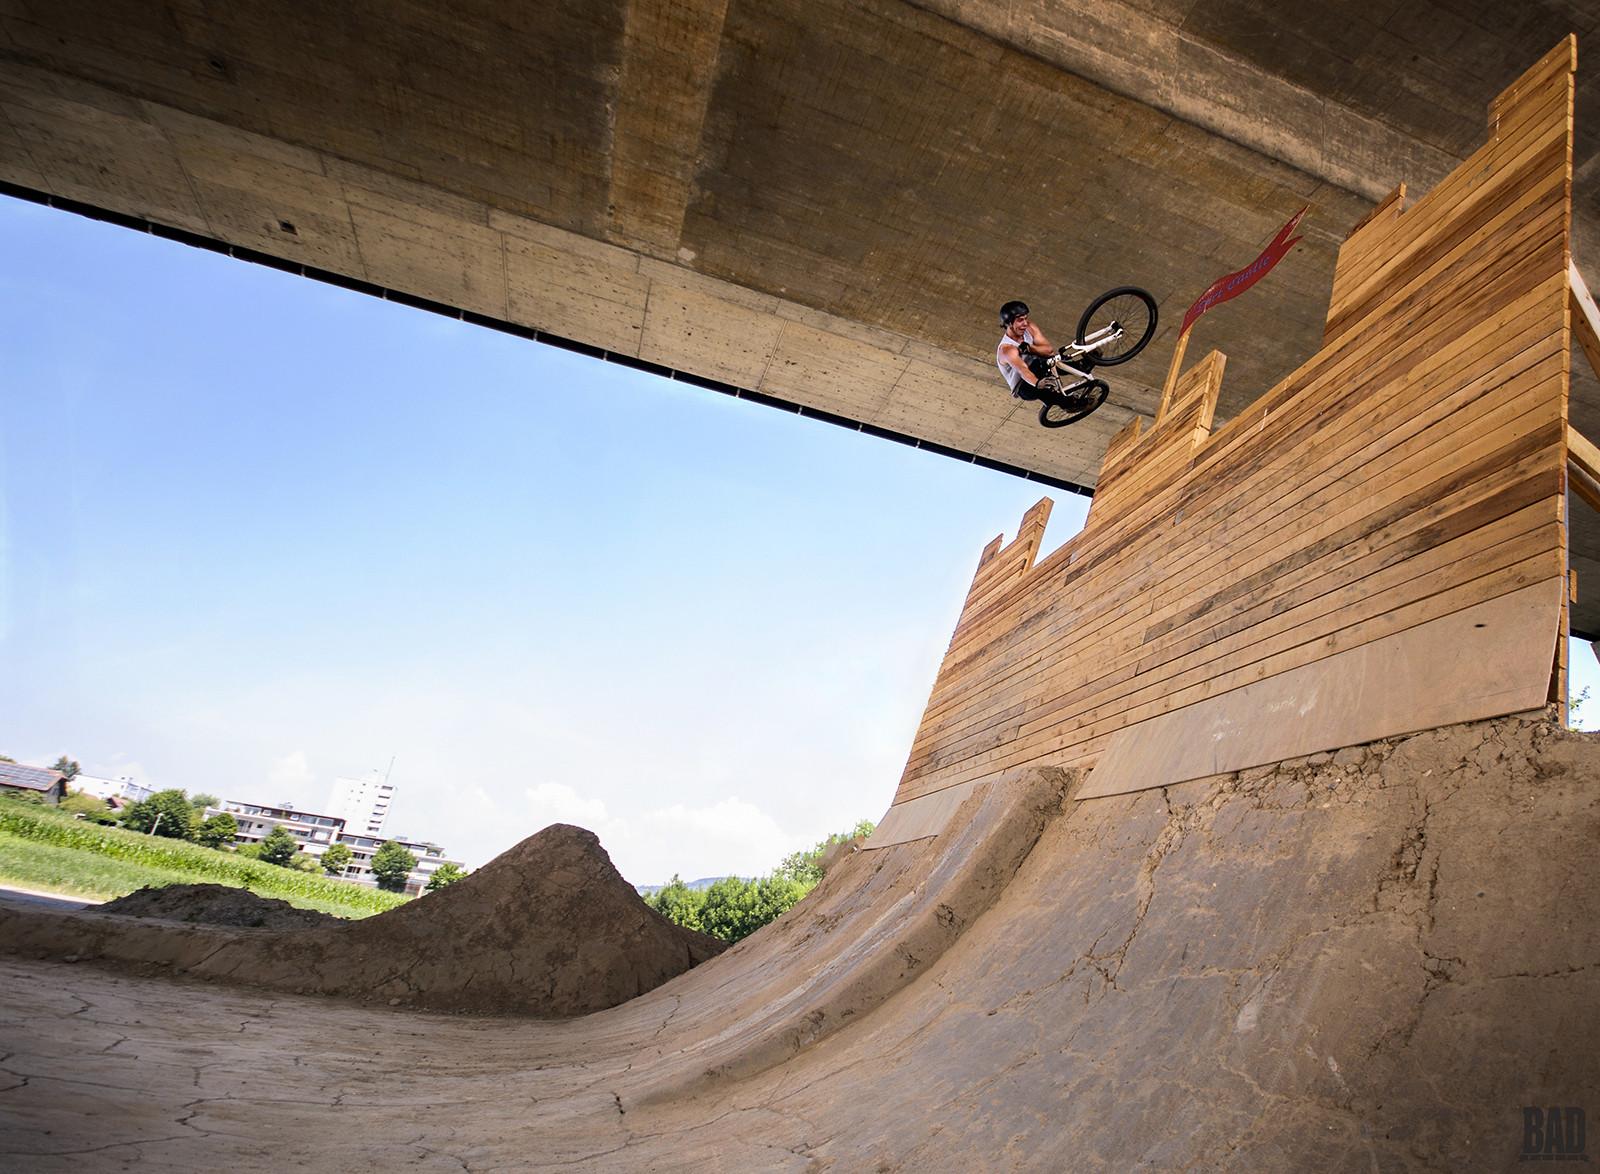 Table Dirt Castle - Roteiro - Mountain Biking Pictures - Vital MTB